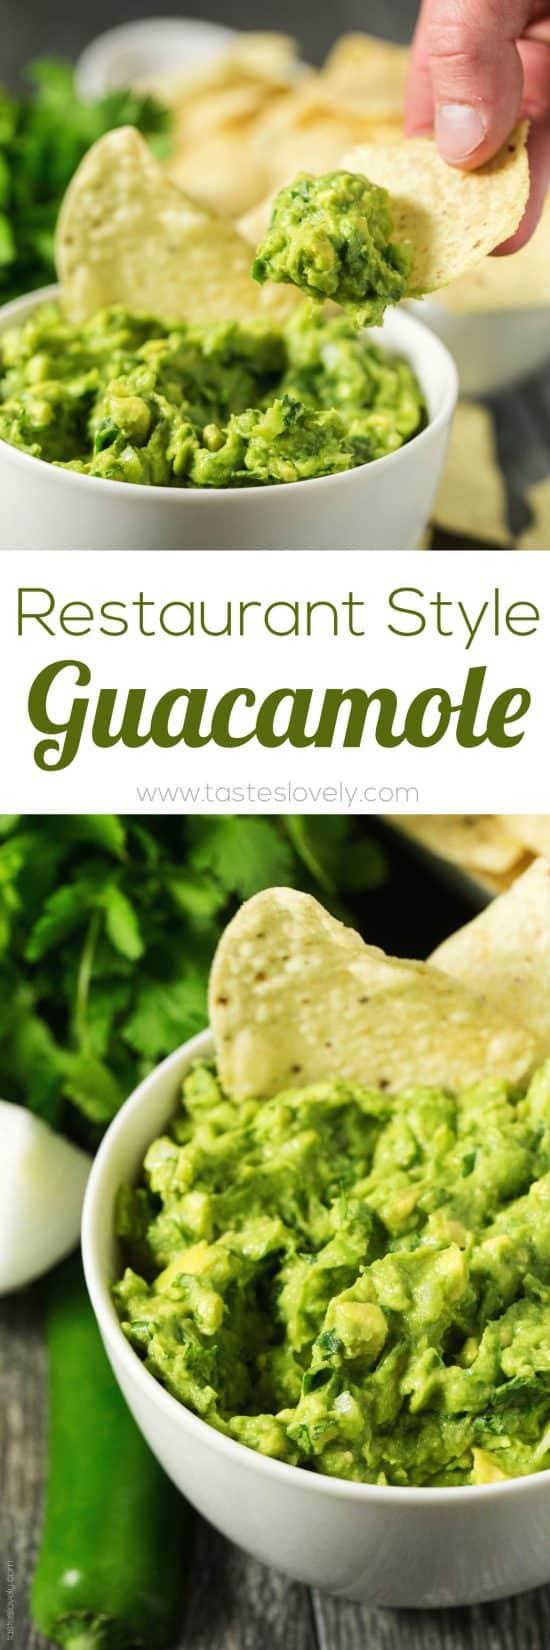 Mexican Restaurant Style Guacamole